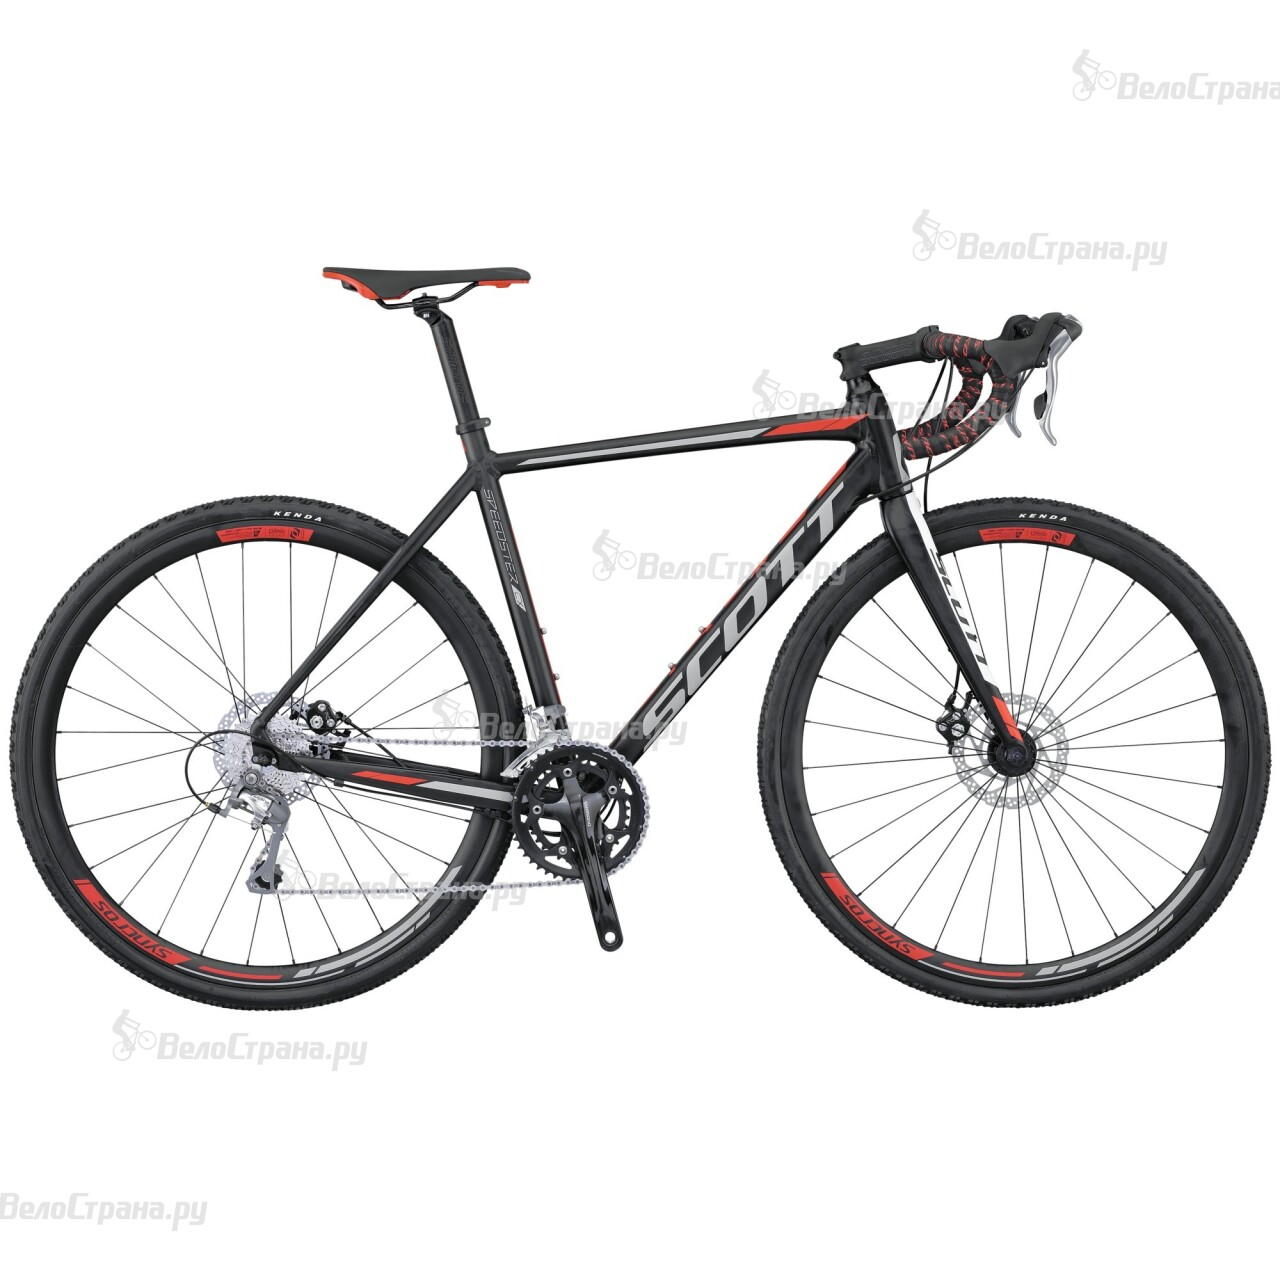 Велосипед Scott Speedster CX 20 Disc (2016)